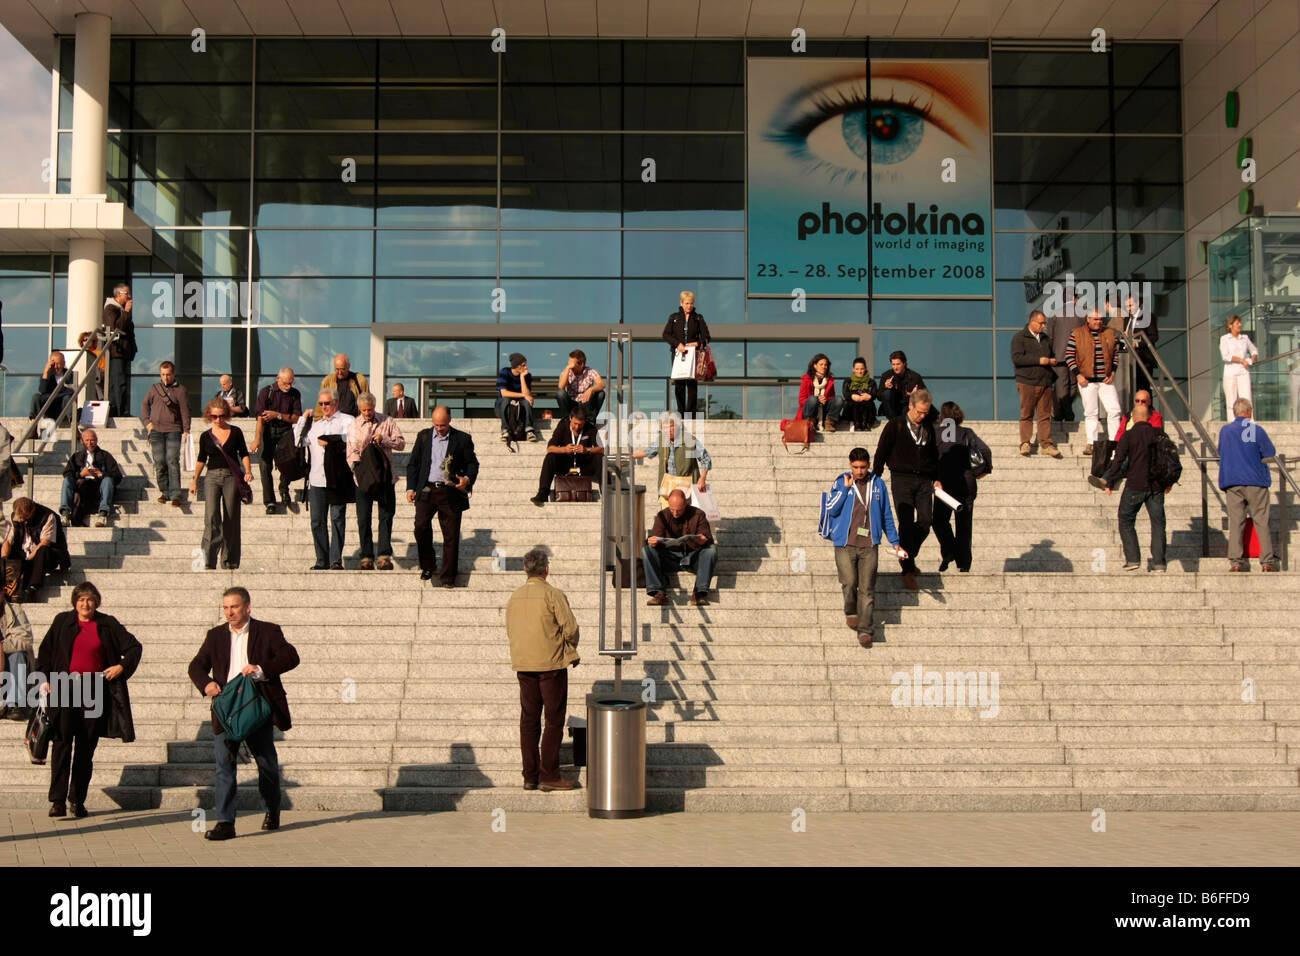 Photokina messeplatz cologne germany Photokina Cologne 2018 - Trade Fairs